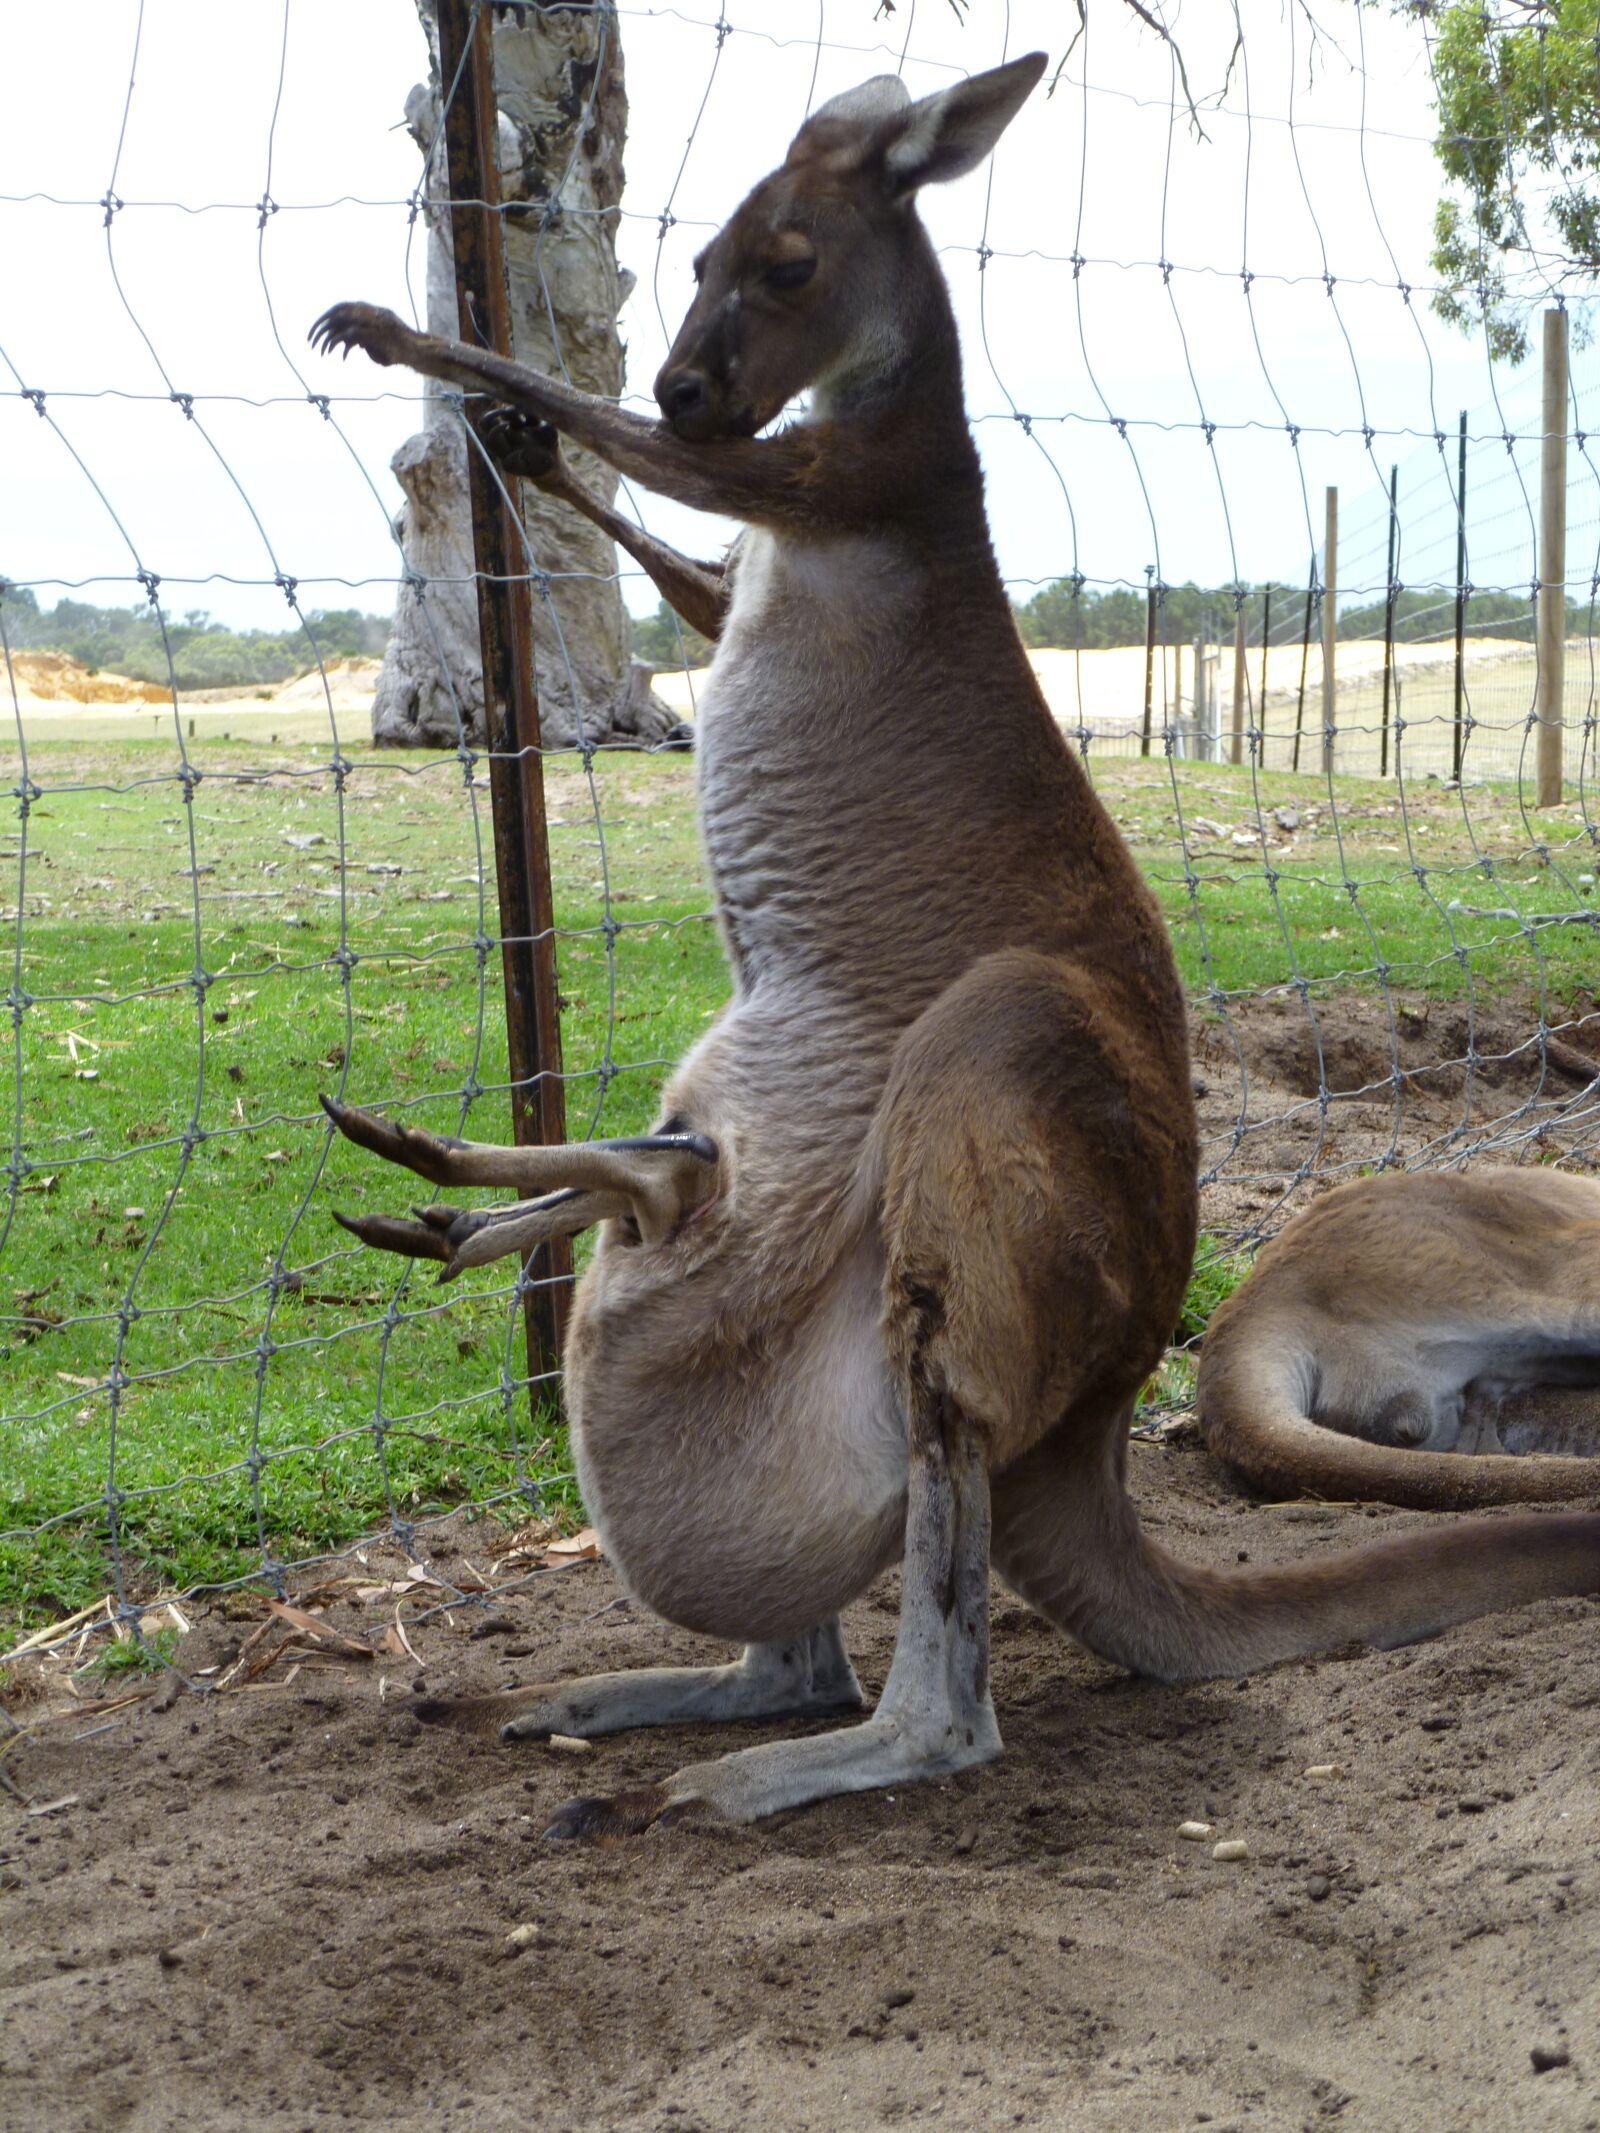 "Panasonic DMC-FH20 sample photo. ""Kangaroo, joey, australia"" photography"